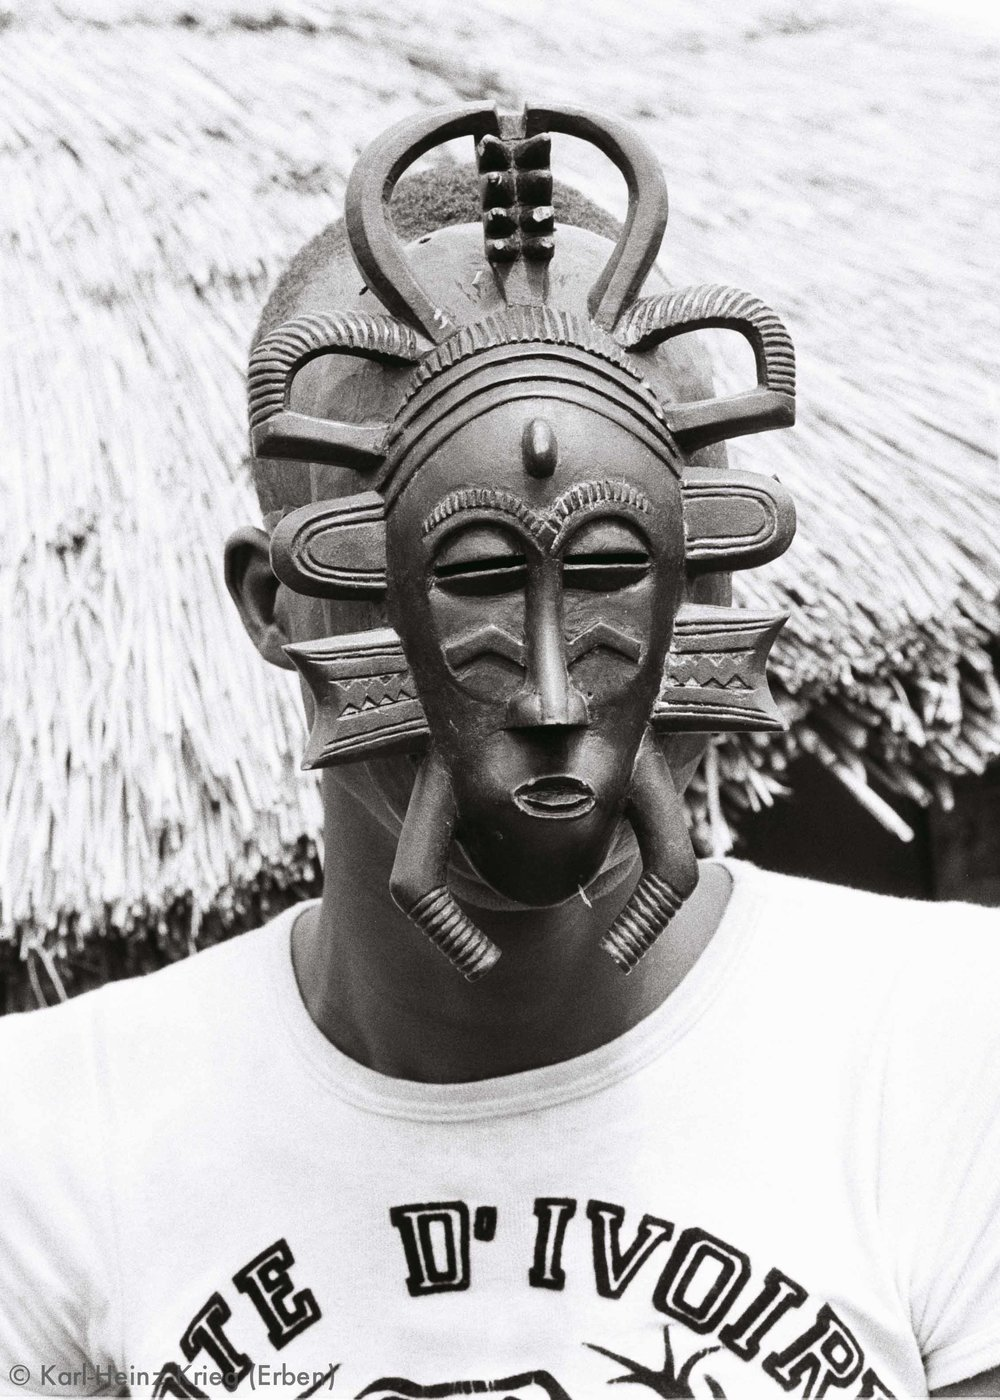 Kodaliyèhè mask carved by Sécondjéwin Dagnogo in about 1965 and used by the Fono group of Poundiou. Poundiou (Region of Boundiali, Côte d'Ivoire),1977. Photo: Karl-Heinz Krieg